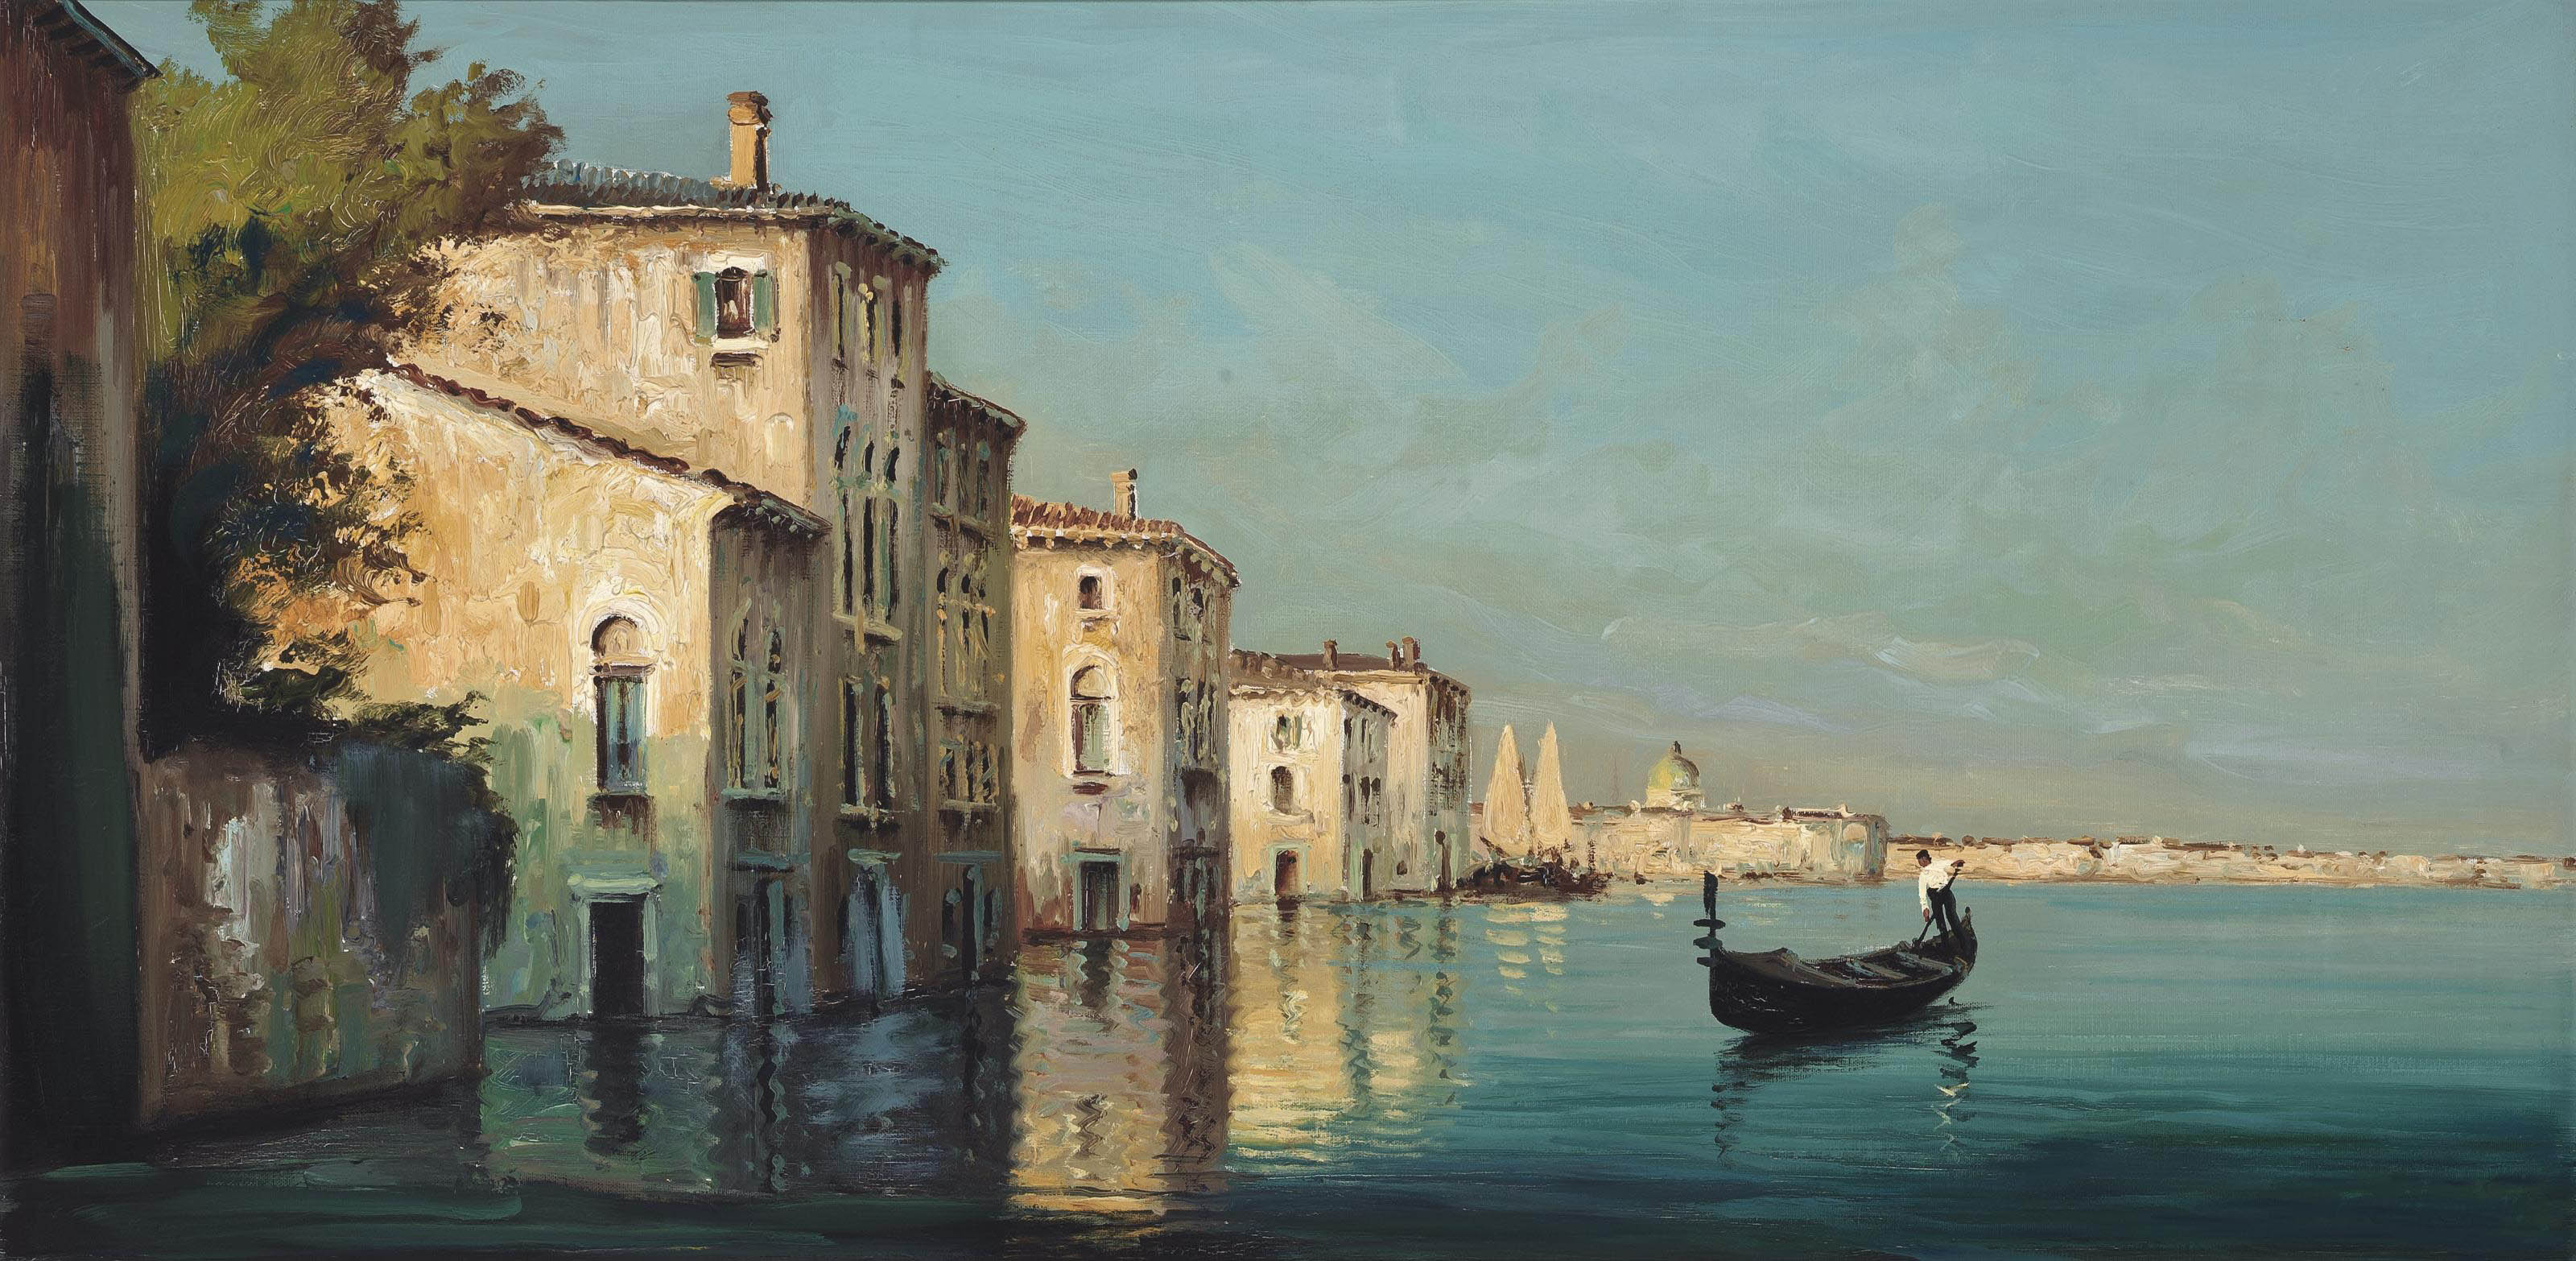 A gondolier on the Venetian lagoon